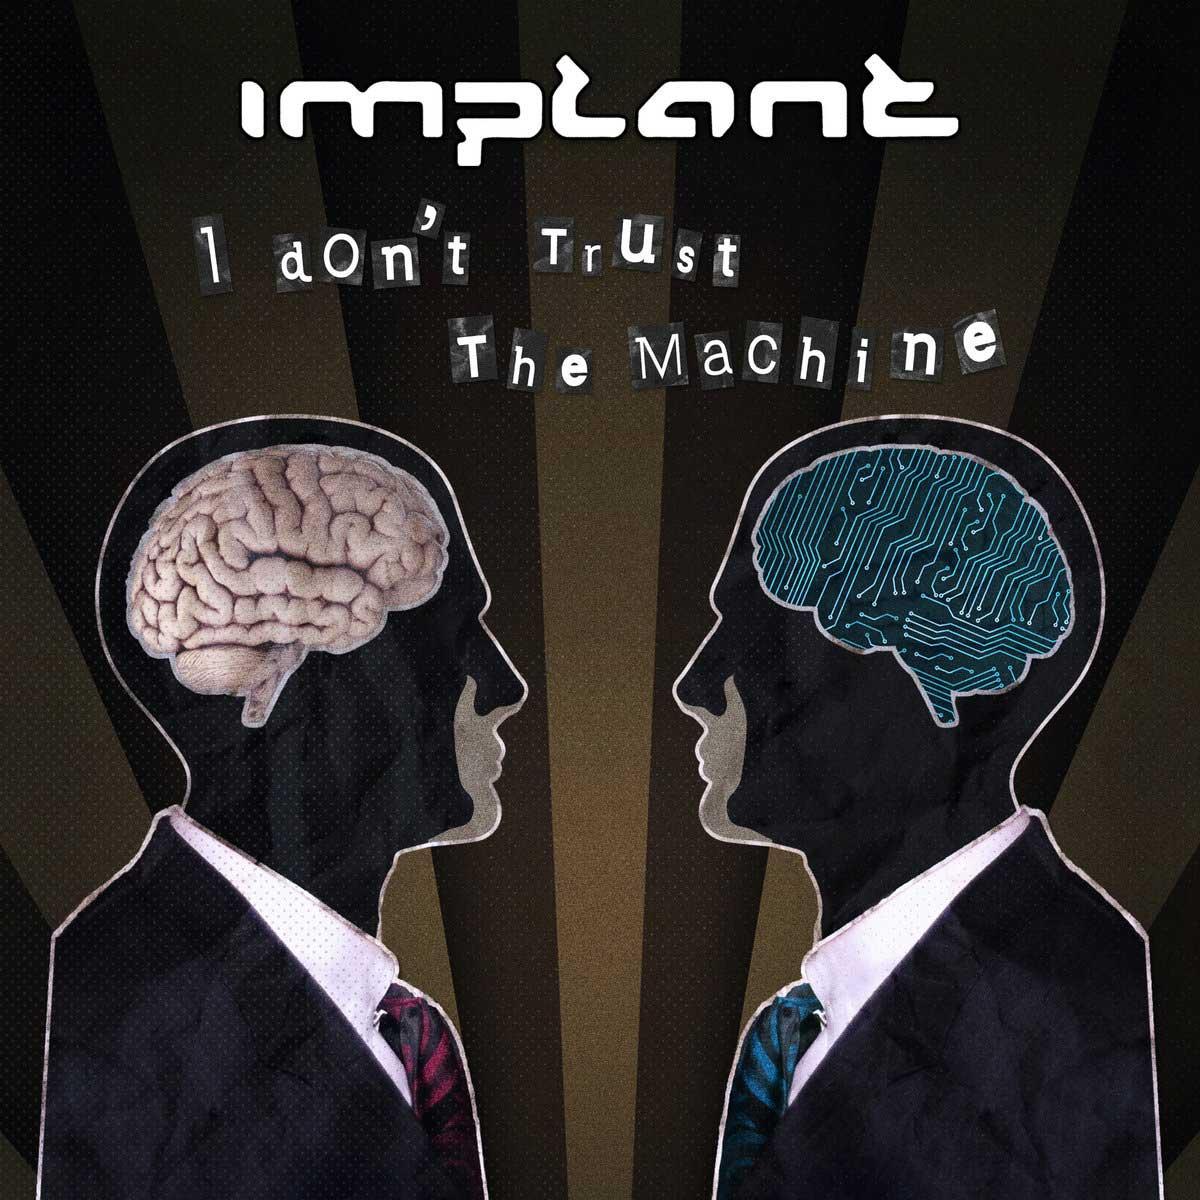 Implant - I Don't Trust The Machines - Implant - I Don't Trust The Machines